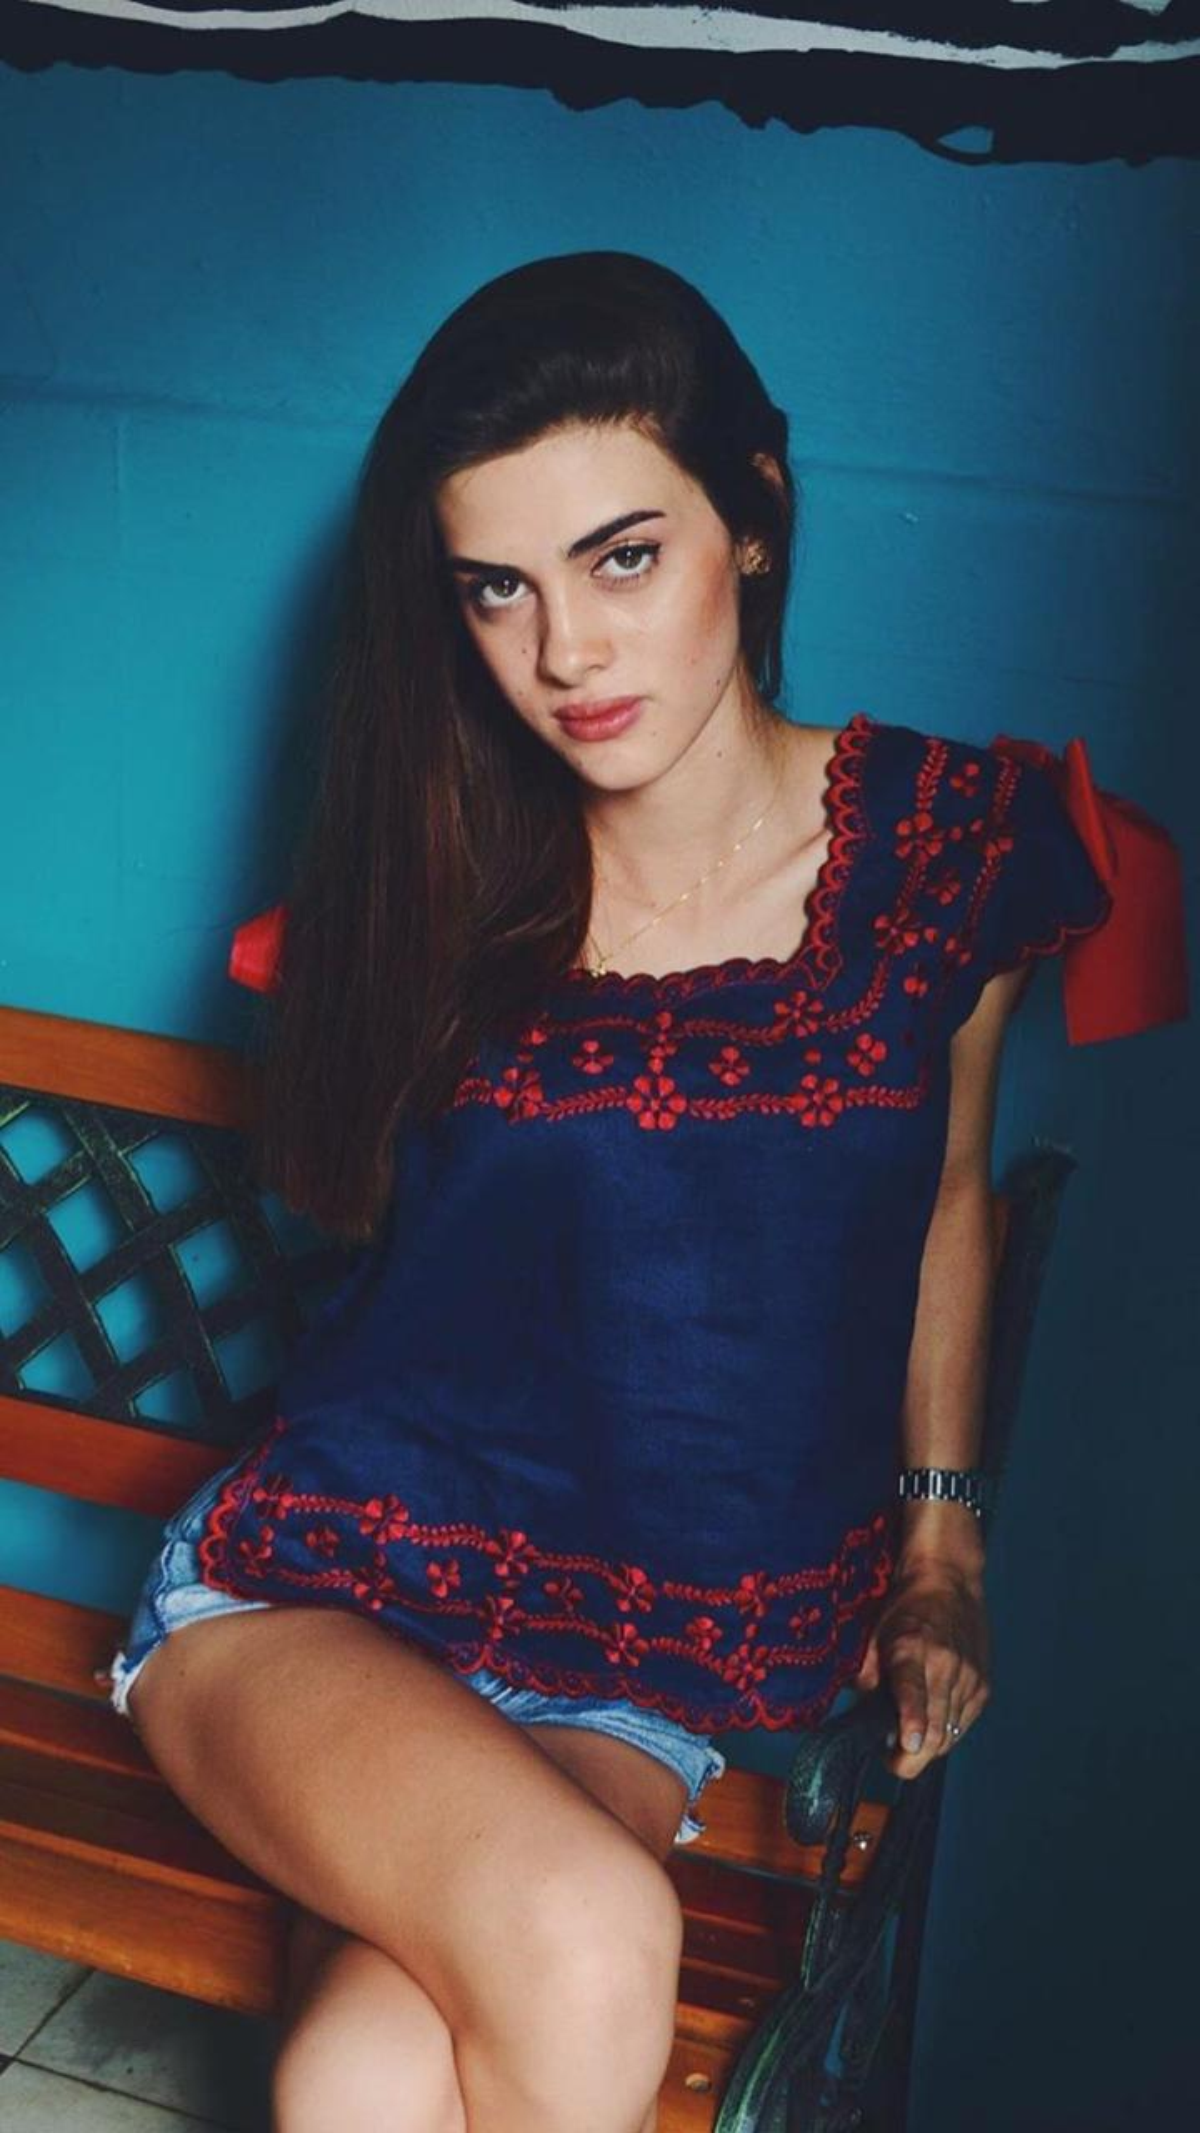 Azul Marino con rojo